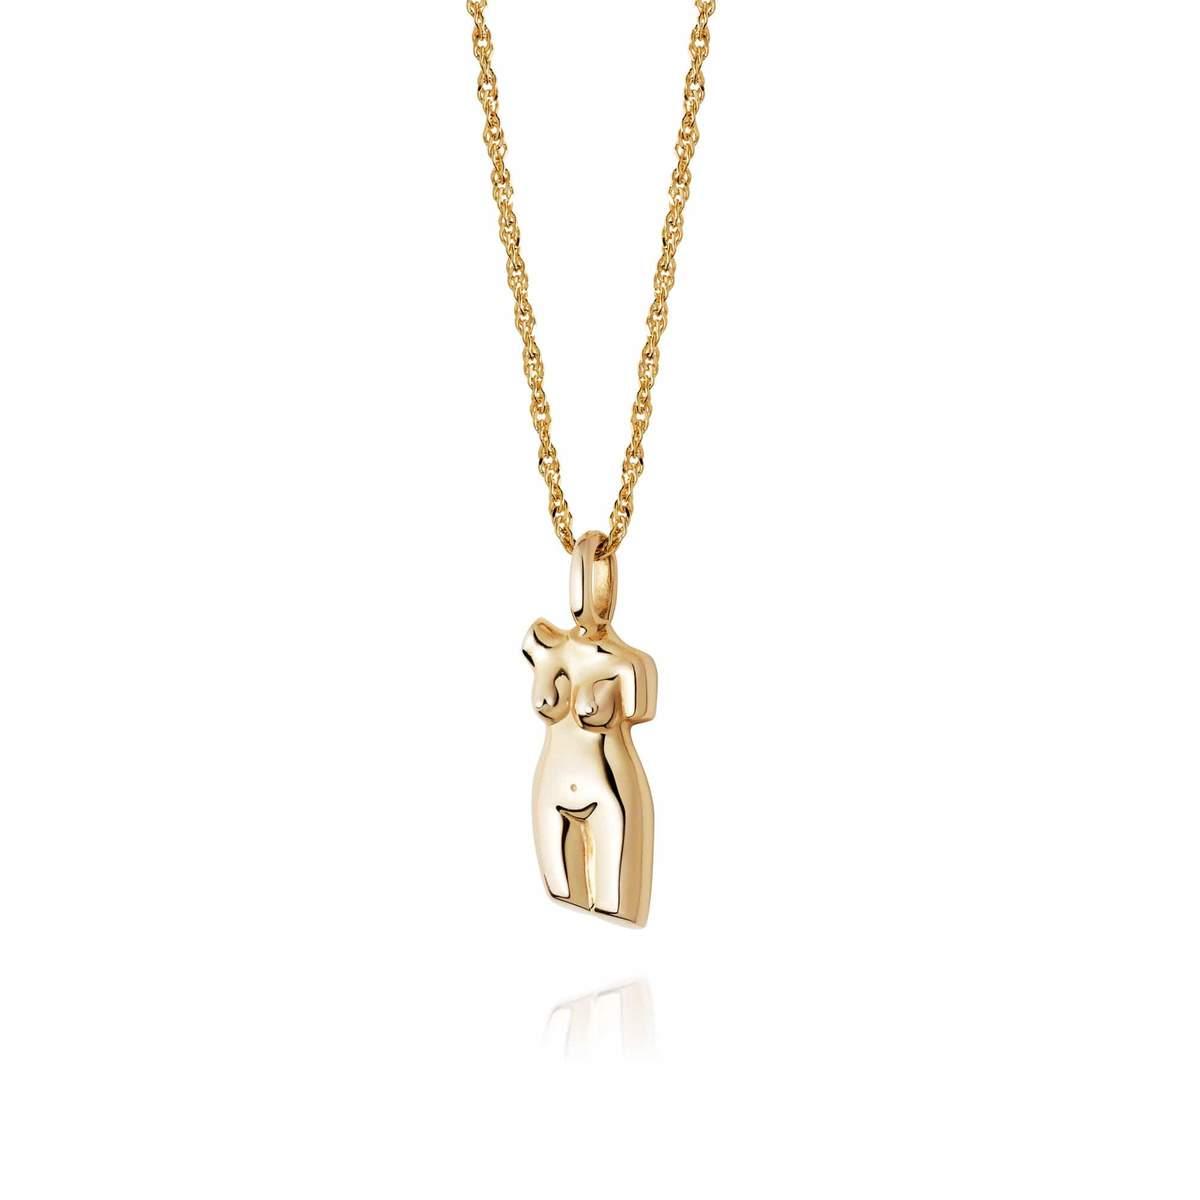 VITA NECKLACE - 18CT GOLD PLATE